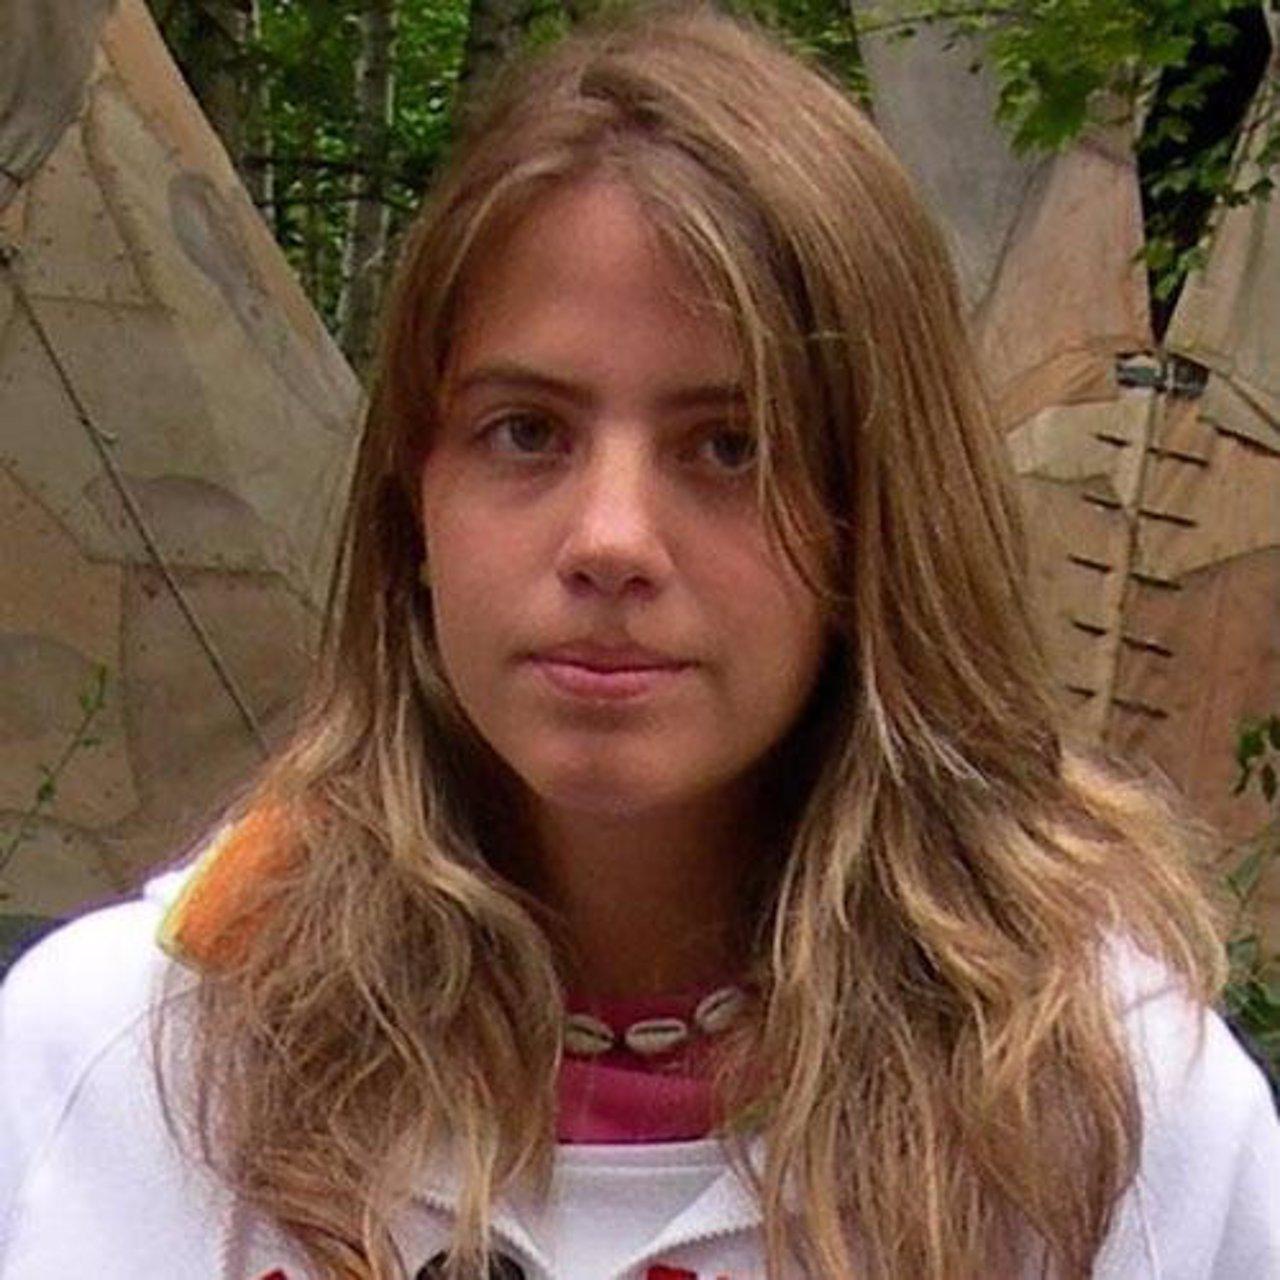 Primer plano de la joven desaparecida en Sevilla, Marta del Castillo